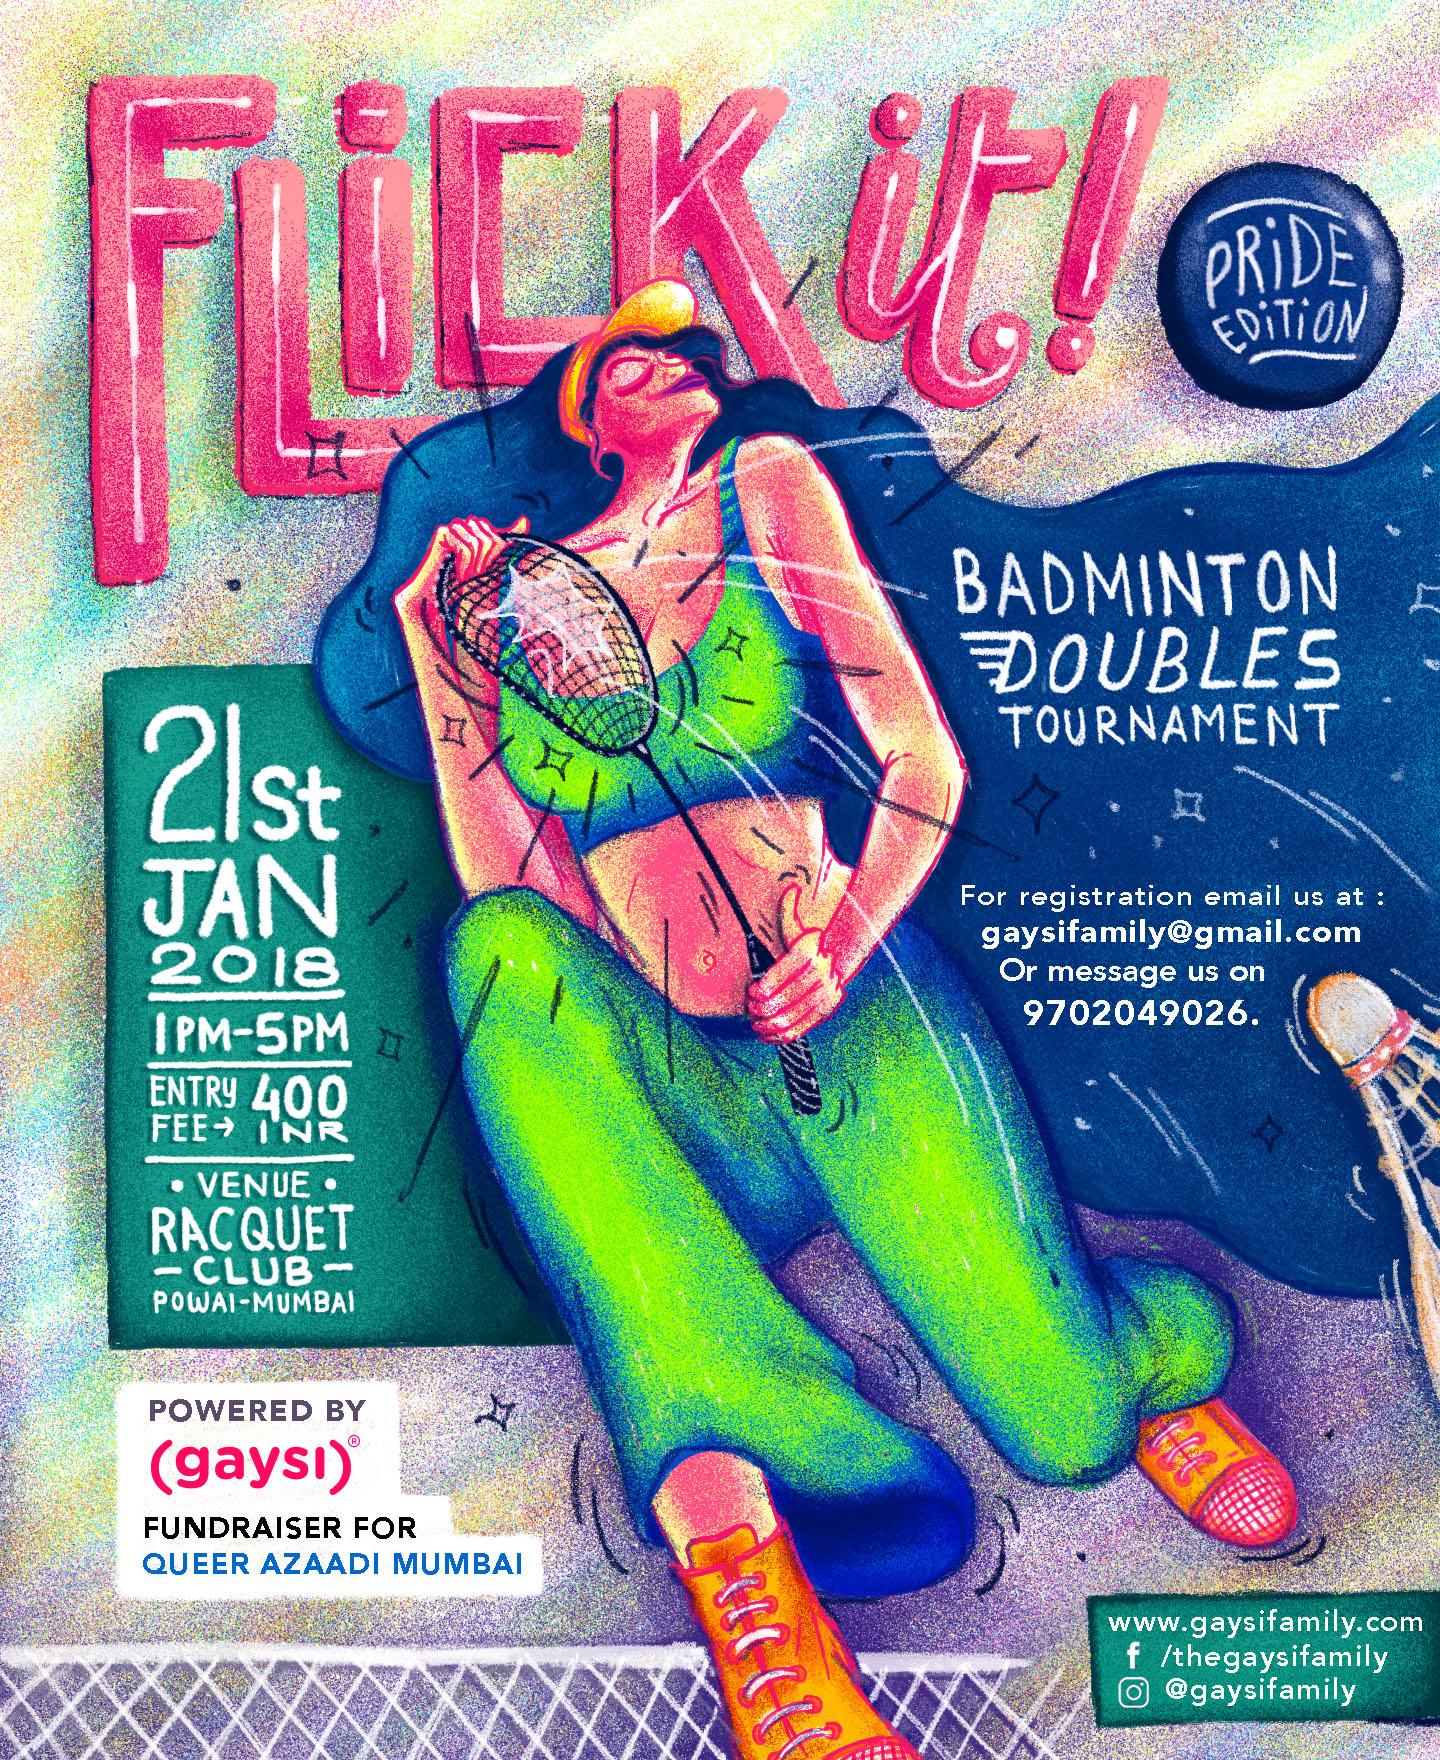 Flick It! (Pride Edition) – Badminton Doubles Tournament